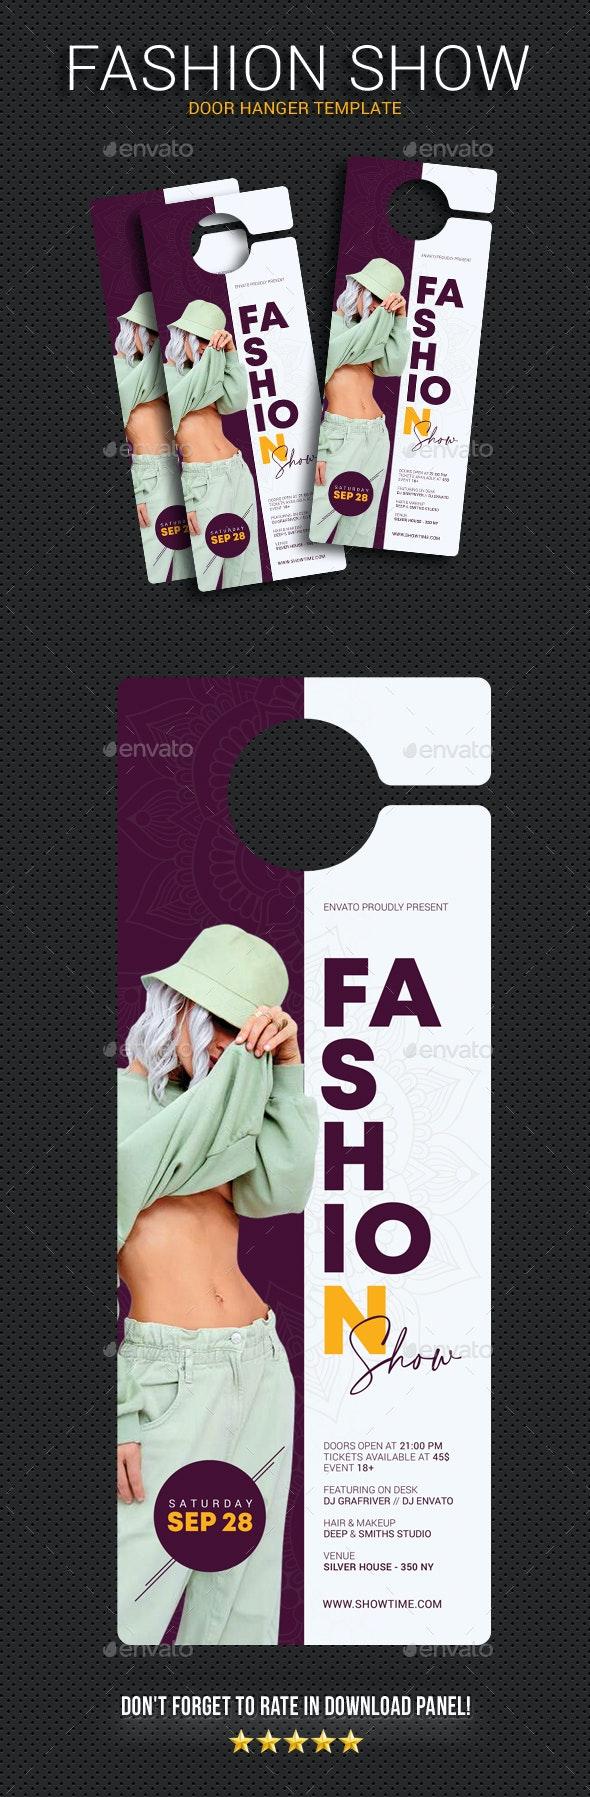 Fashion Show Door Hanger - Miscellaneous Print Templates